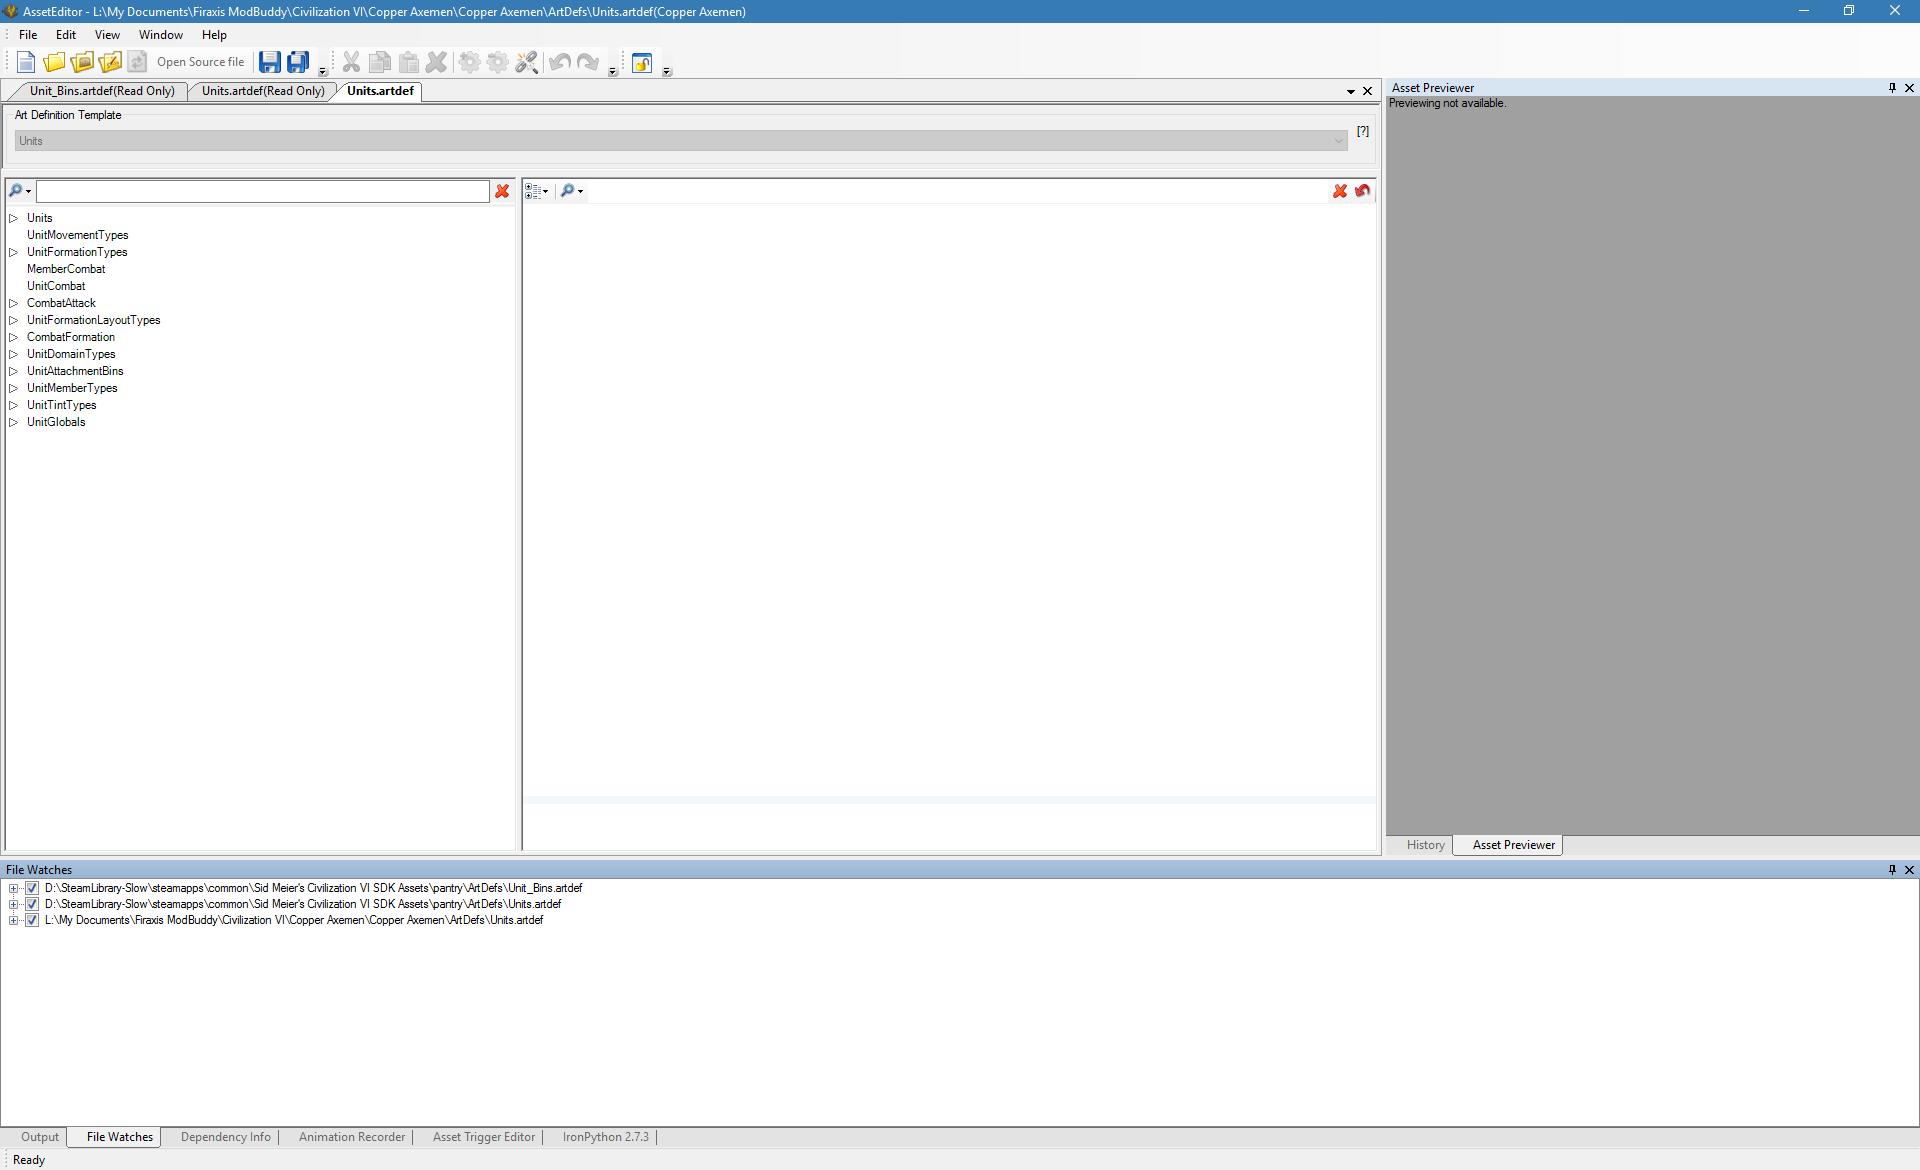 Opening screen Asset Editor